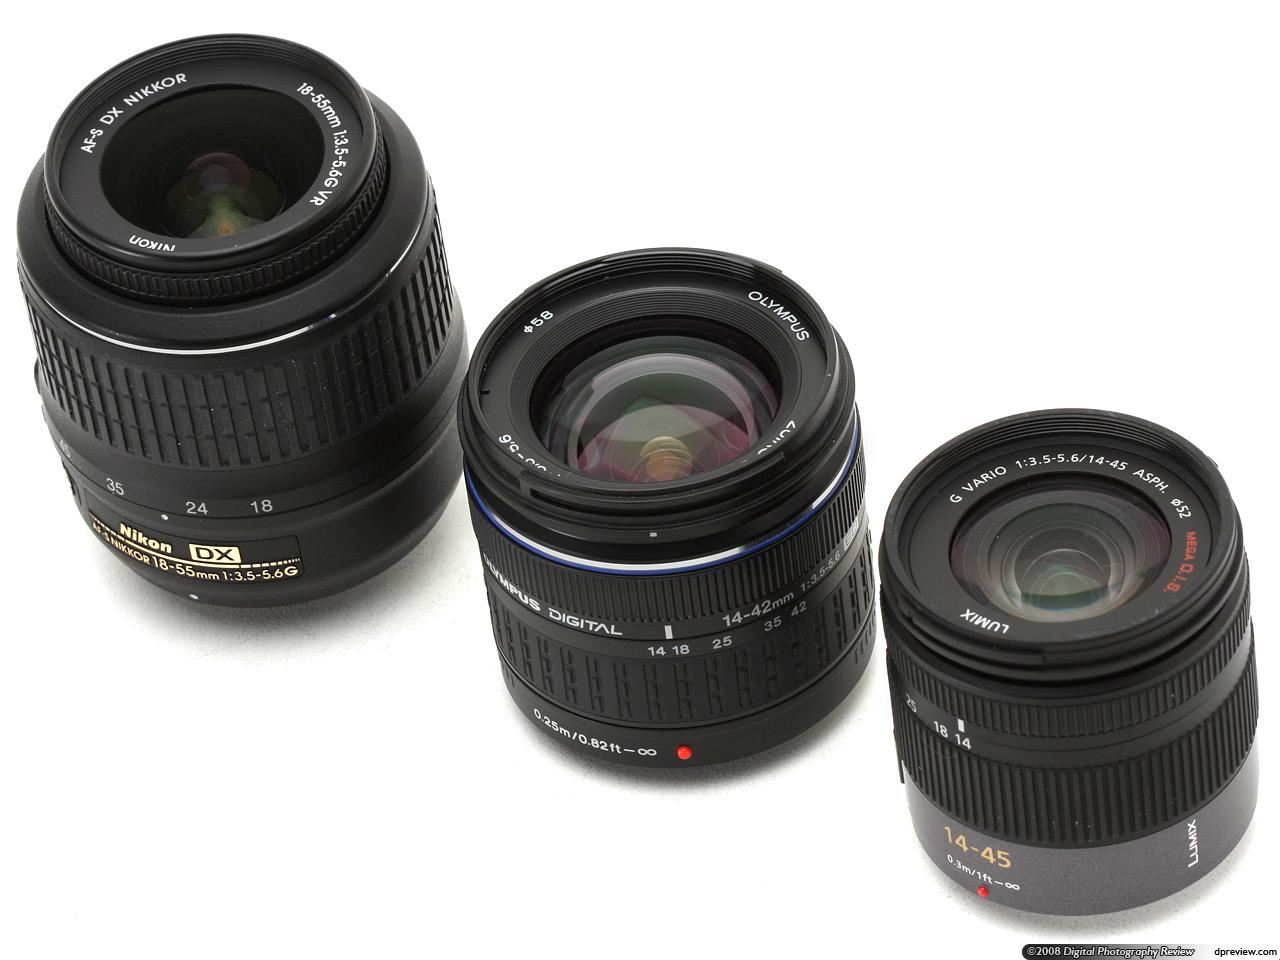 panasonic lumix g1 review digital photography review